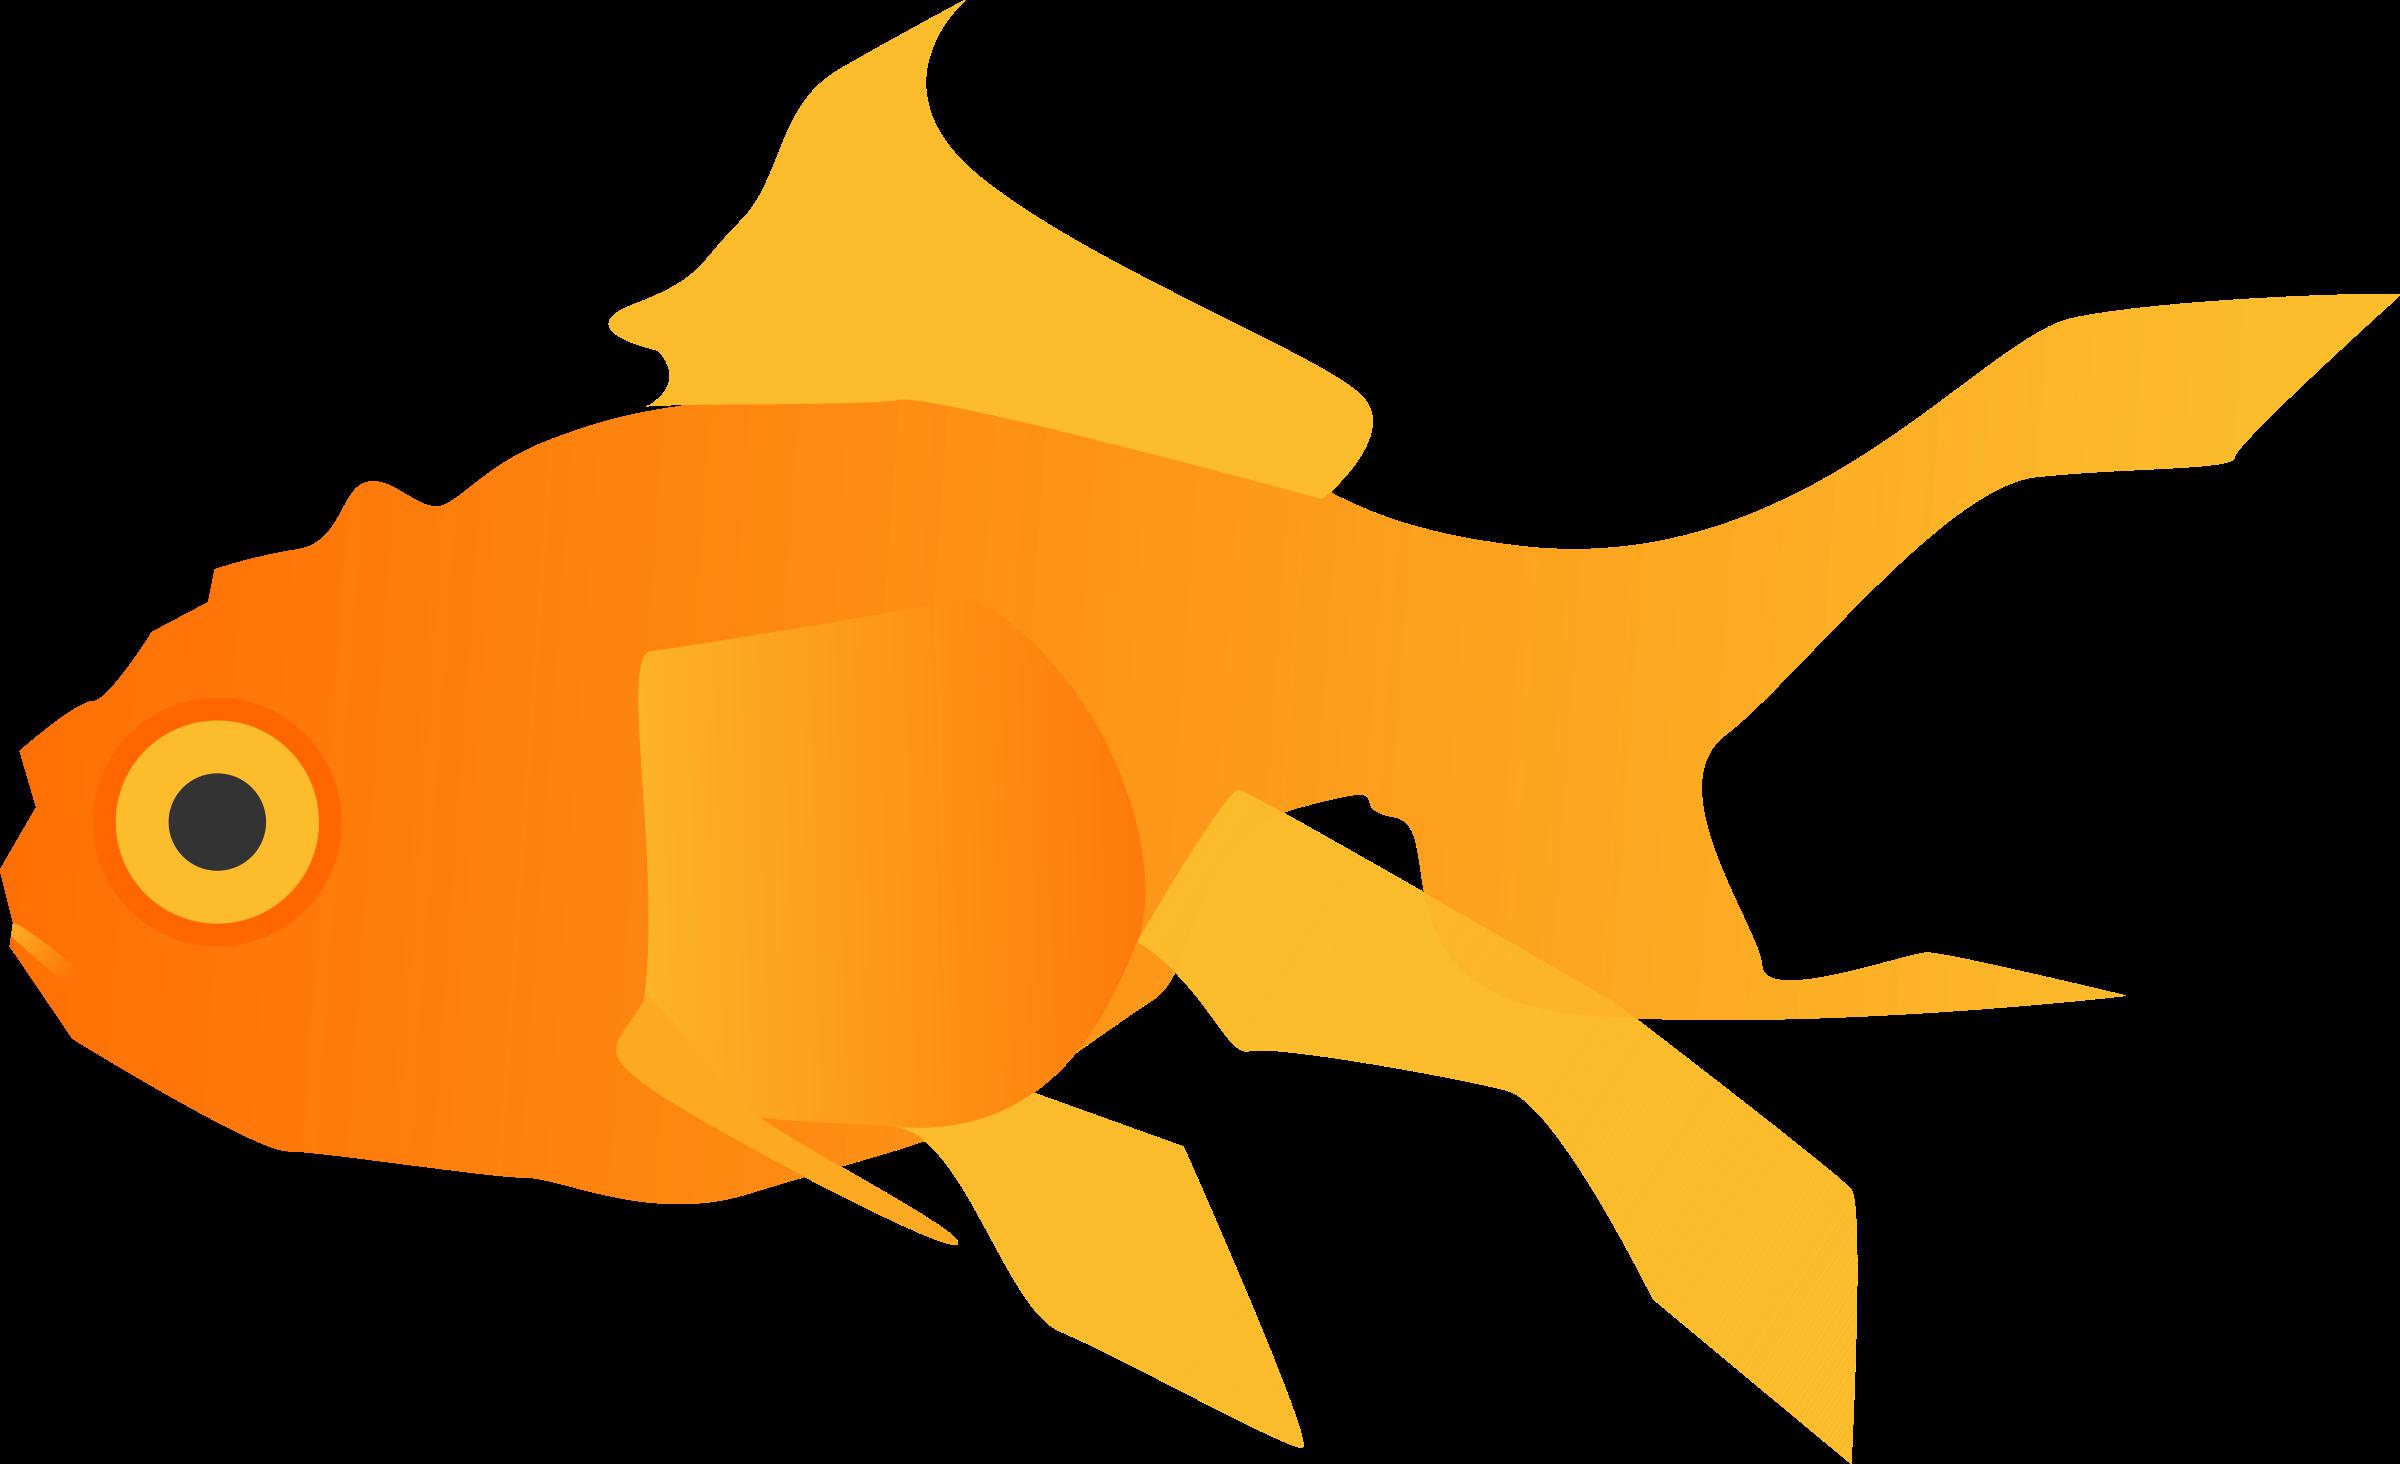 Big image png. Goldfish clipart svg